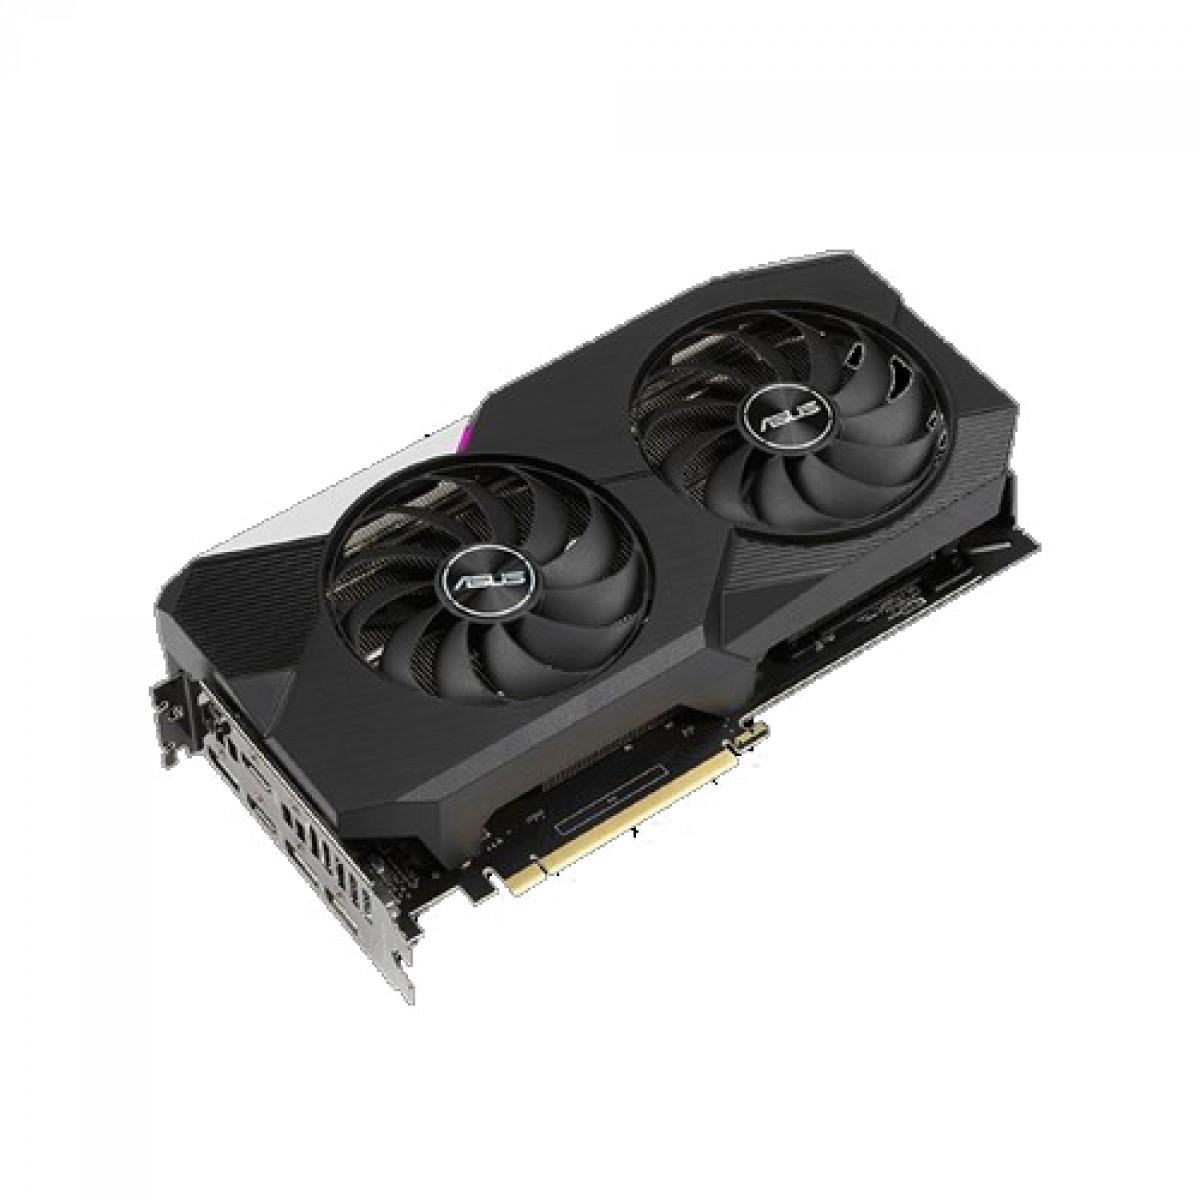 Placa de Vídeo Asus Geforce RTX 3070 DUAL OC, 8GB GDDR6, 256bit, DUAL-RTX3070-O8G